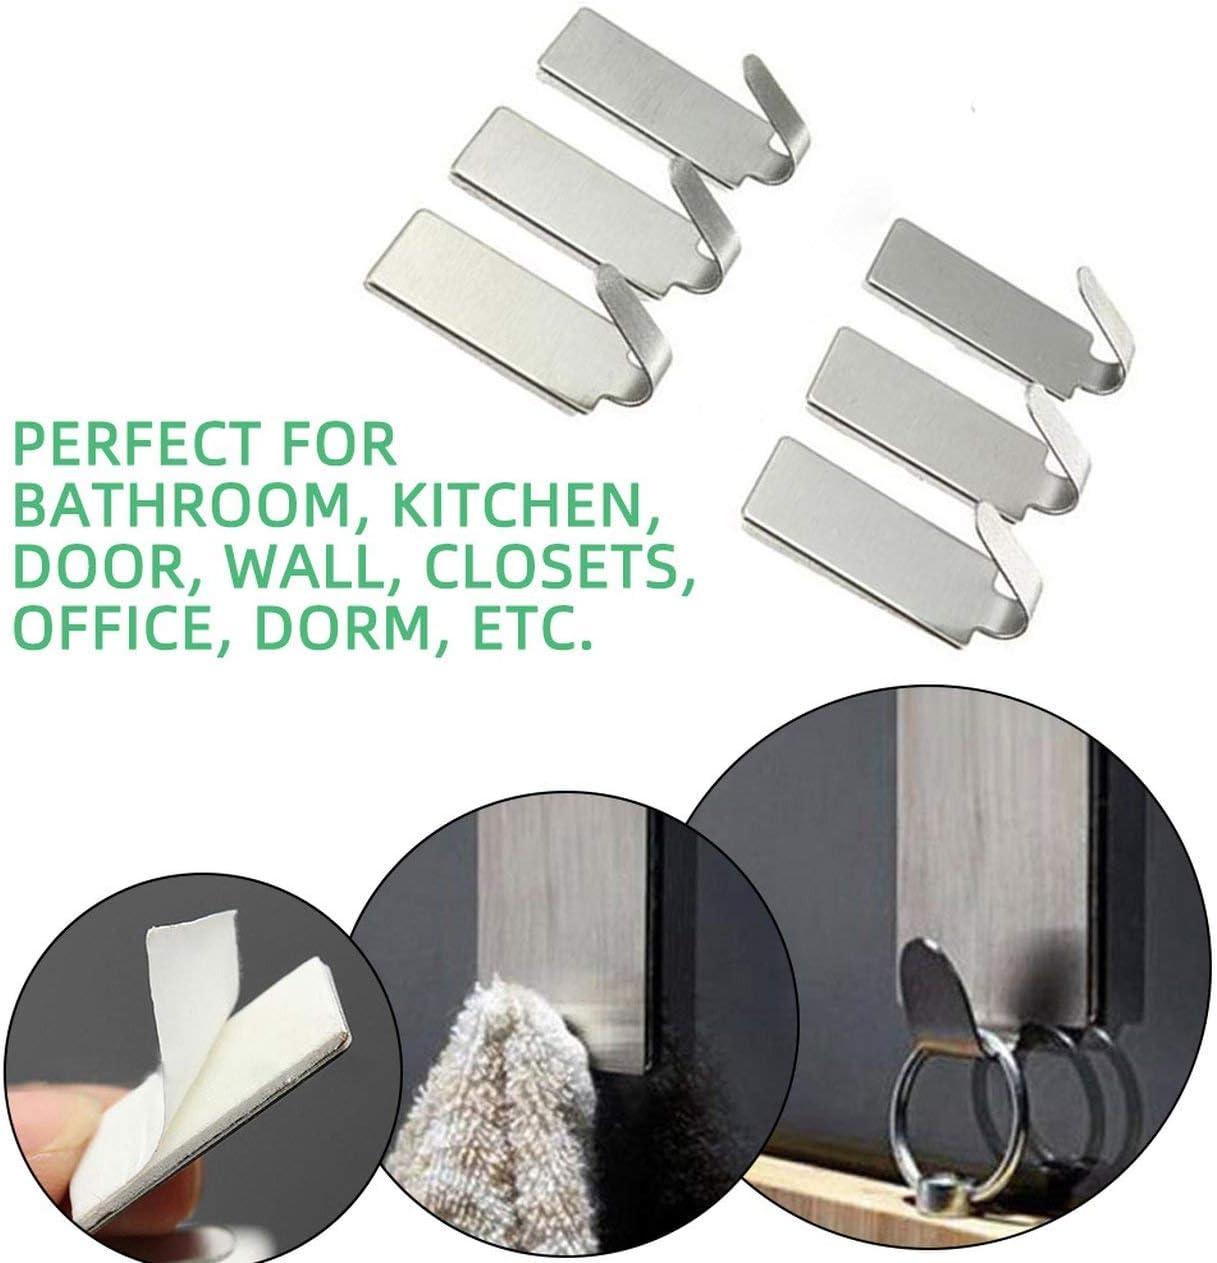 6PCS Self Adhesive Hooks Strong Hanger Home Wall Door Hanger Stainless Steel Holder Hook Hanger for Kitchen Bathroom AD